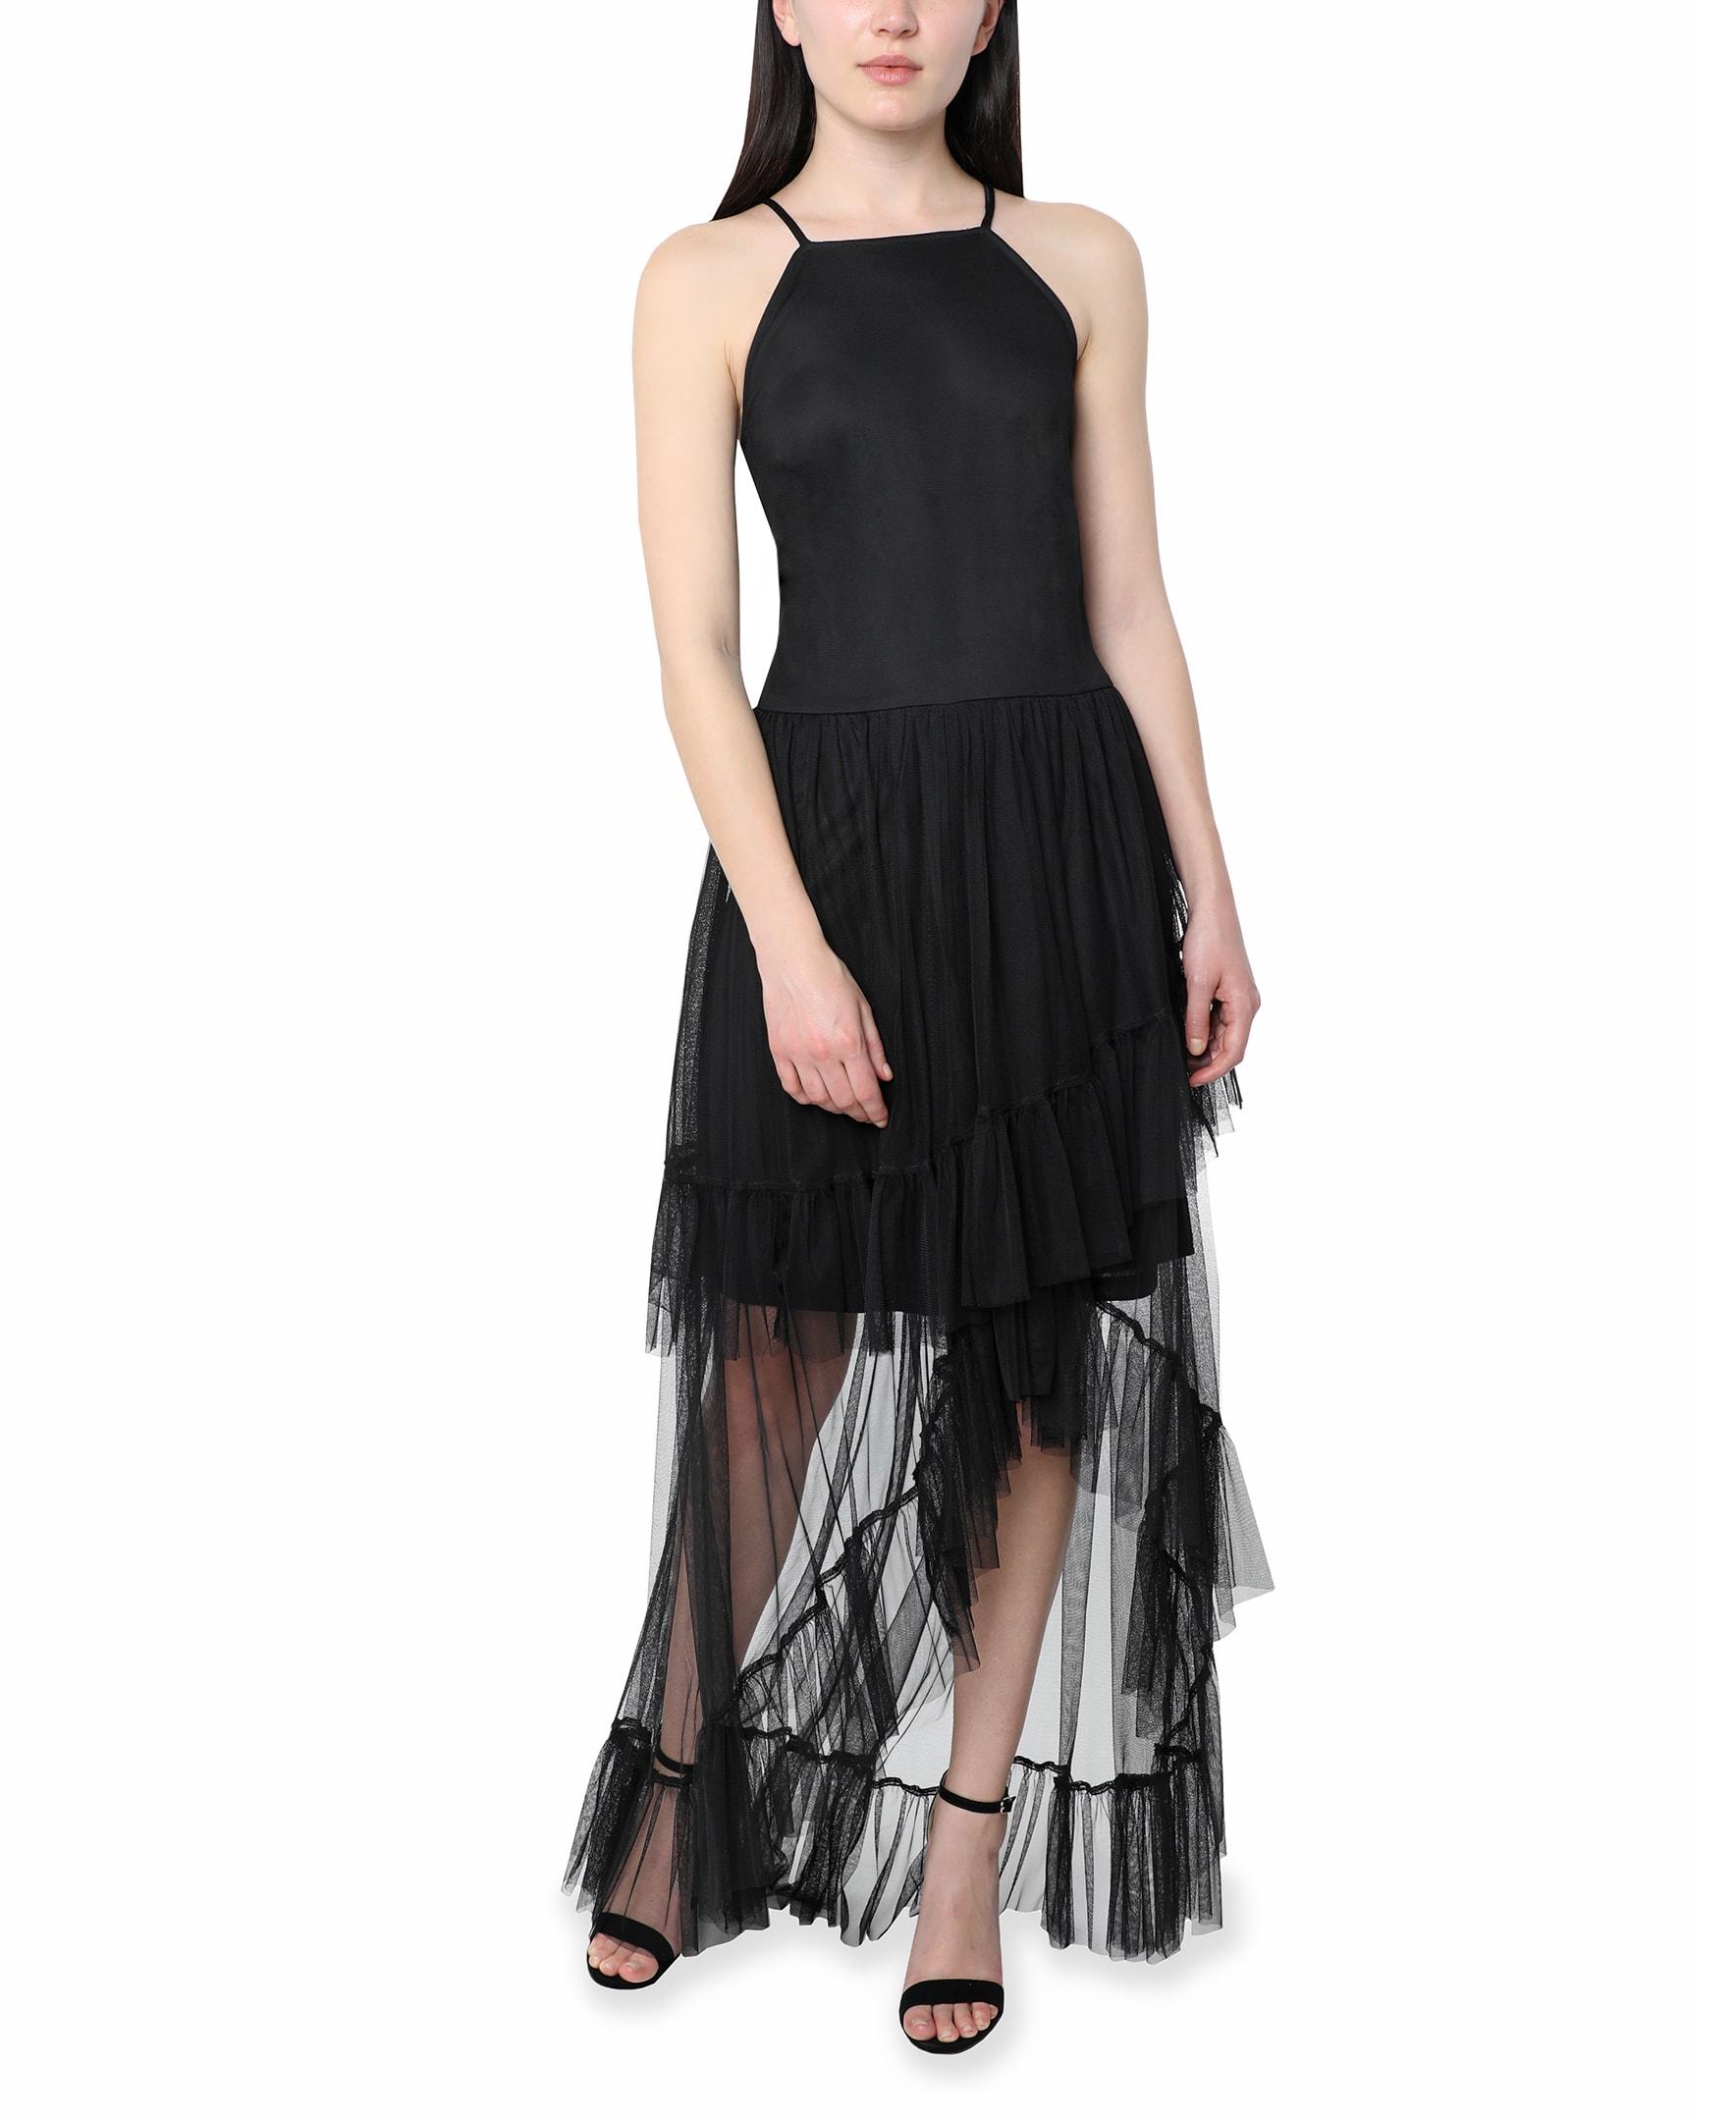 Bebe Halter  Hi Low Gown - black - Front